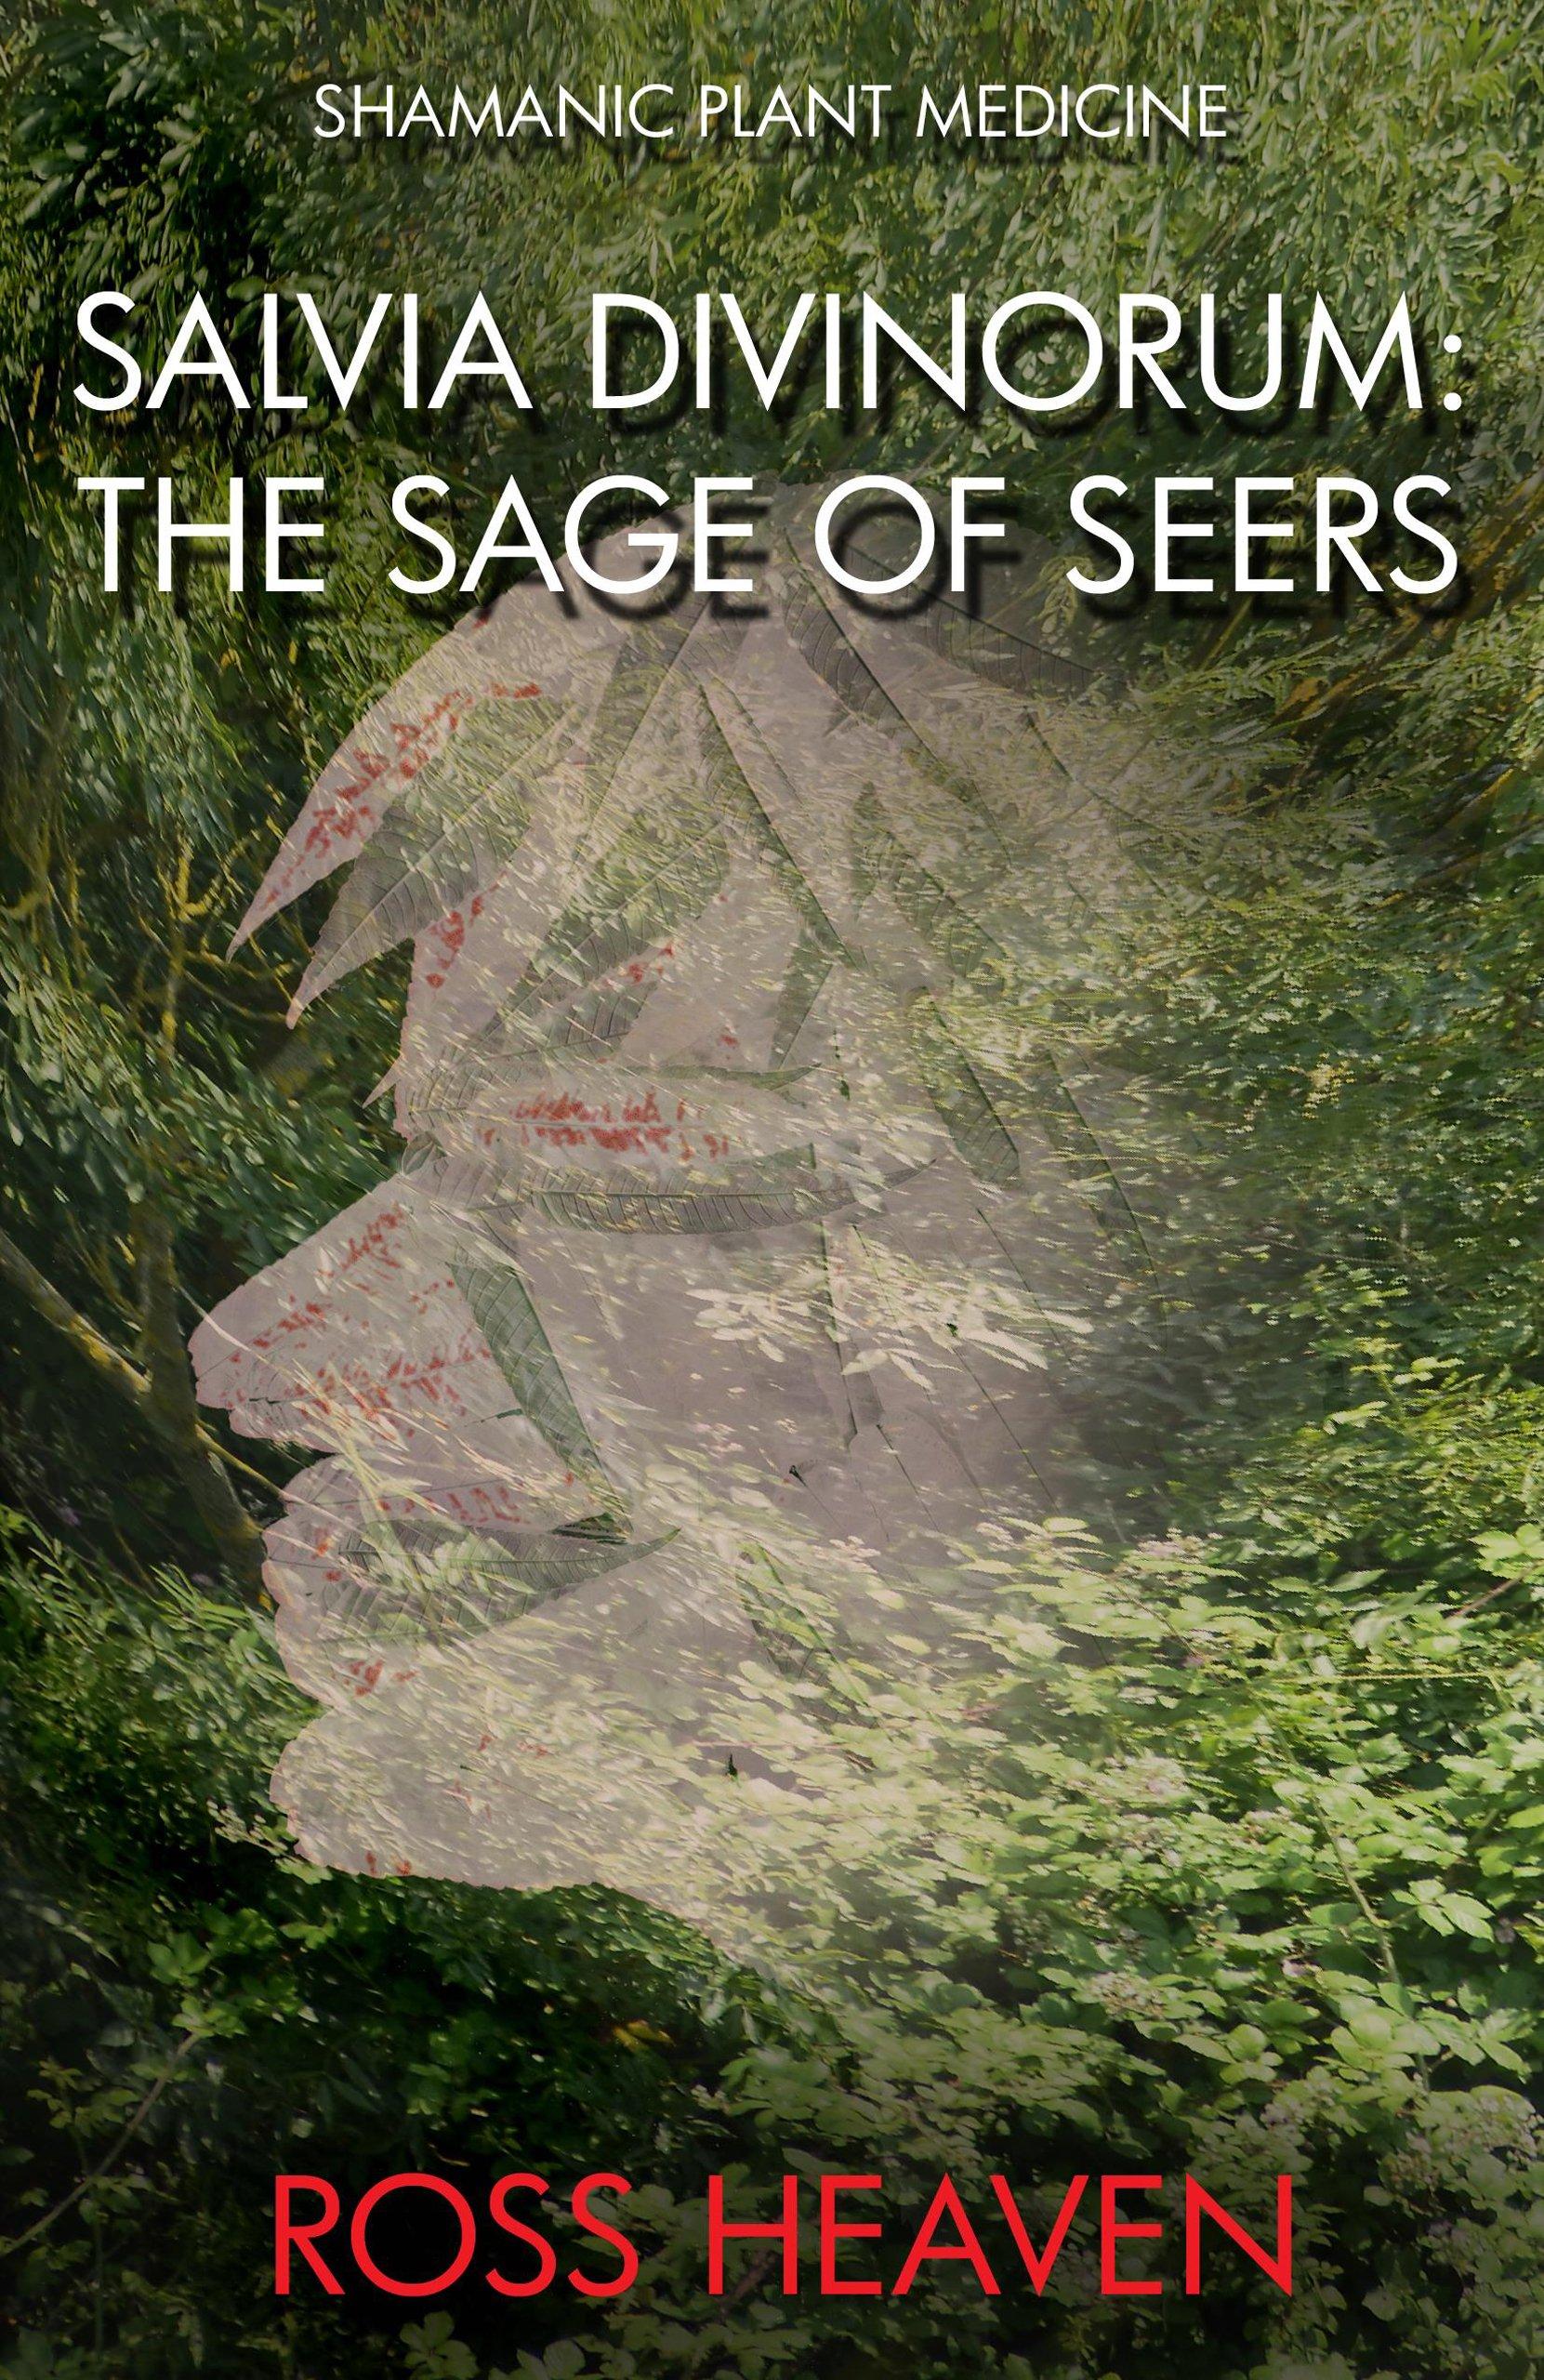 Download Shamanic Plant Medicine - Salvia Divinorum: The Sage of the Seers pdf epub